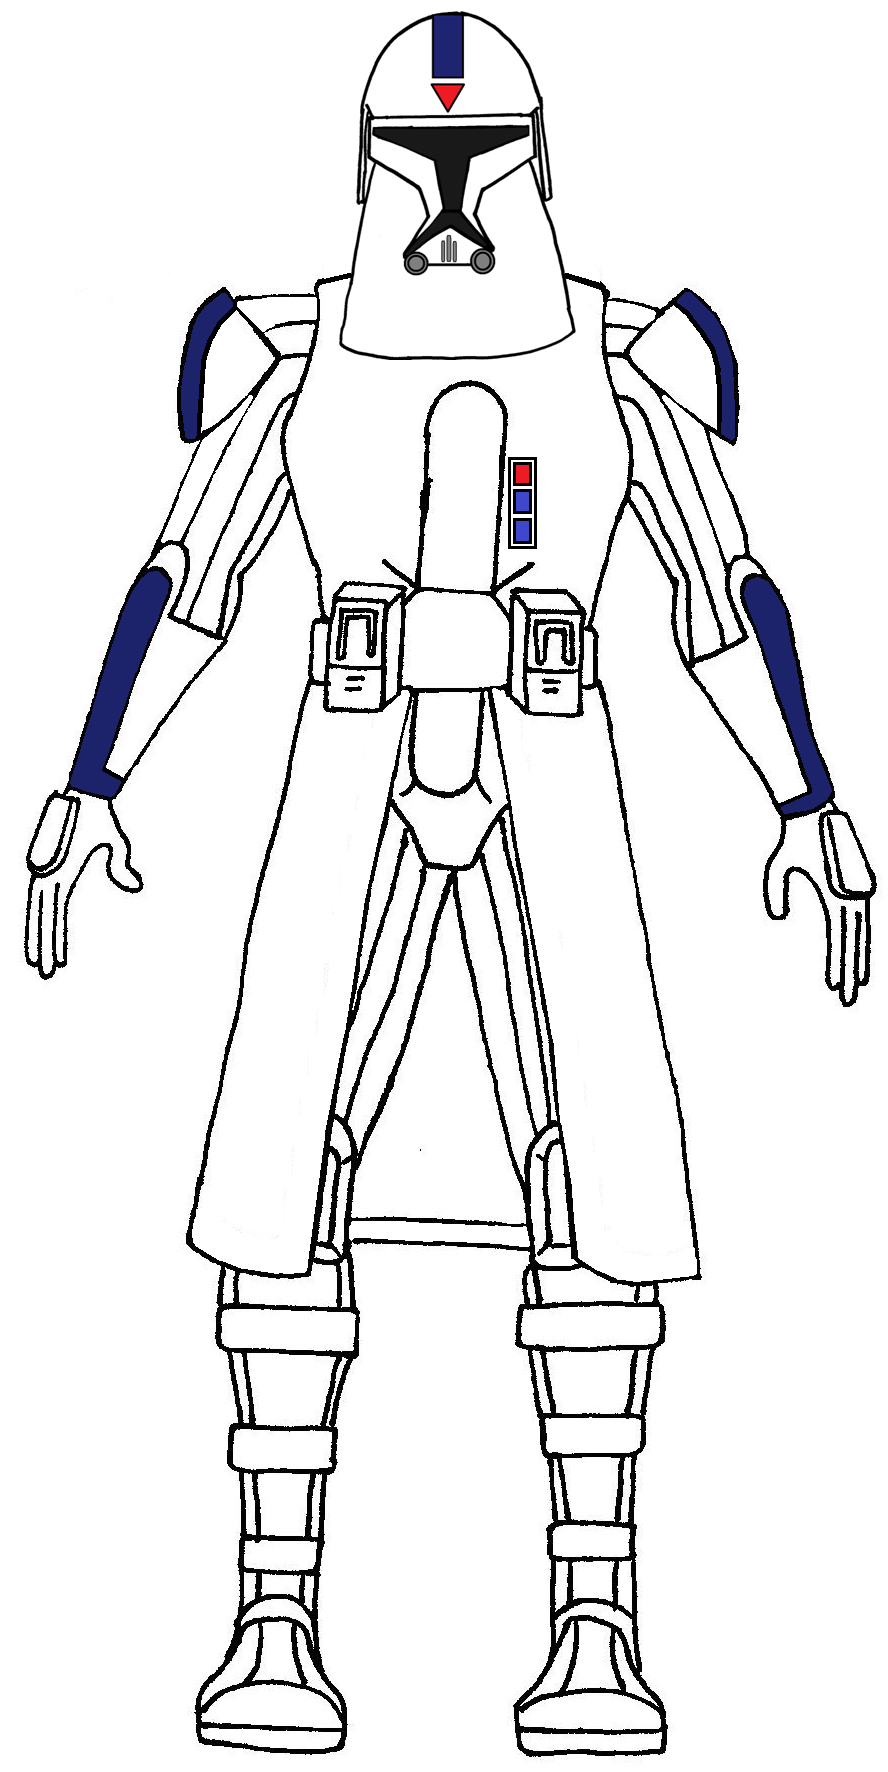 Clone Trooper 501st Legion Cold Assault Corps Star Wars Clone Wars Star Wars Trooper Star Wars Characters